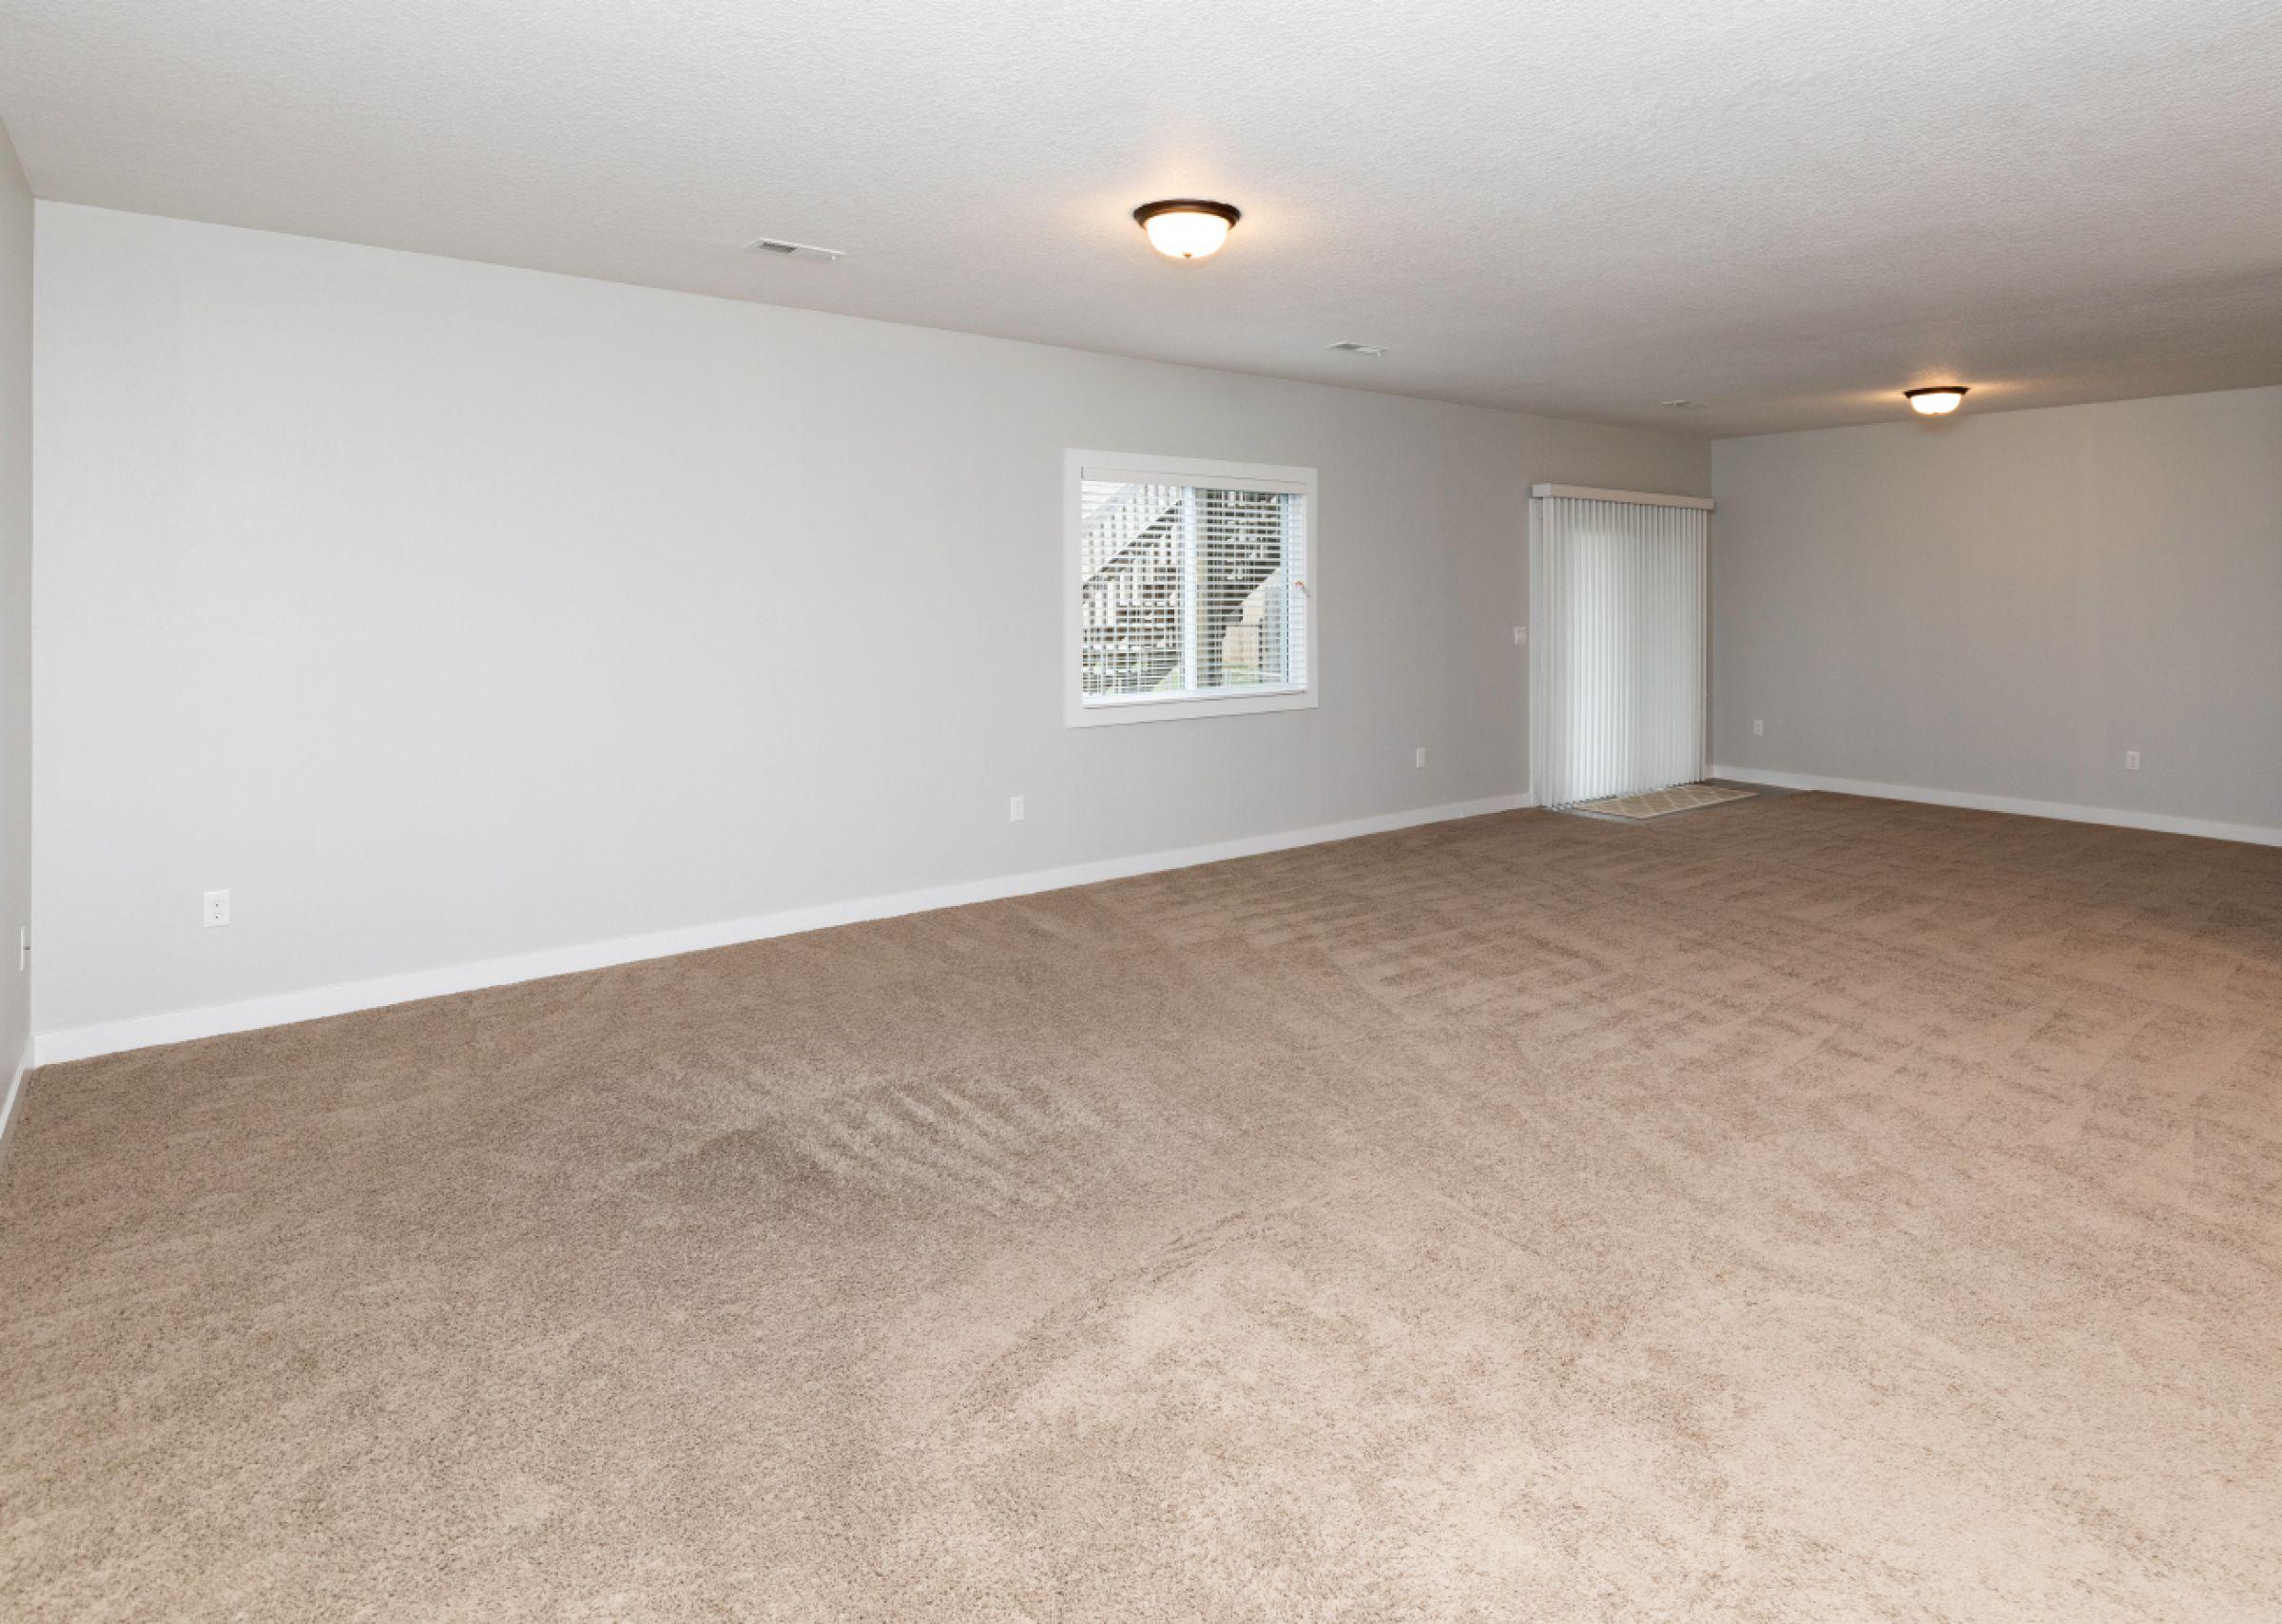 residential-polk-county-iowa-0-acres-listing-number-15273-1-2020-12-08-002650.jpg